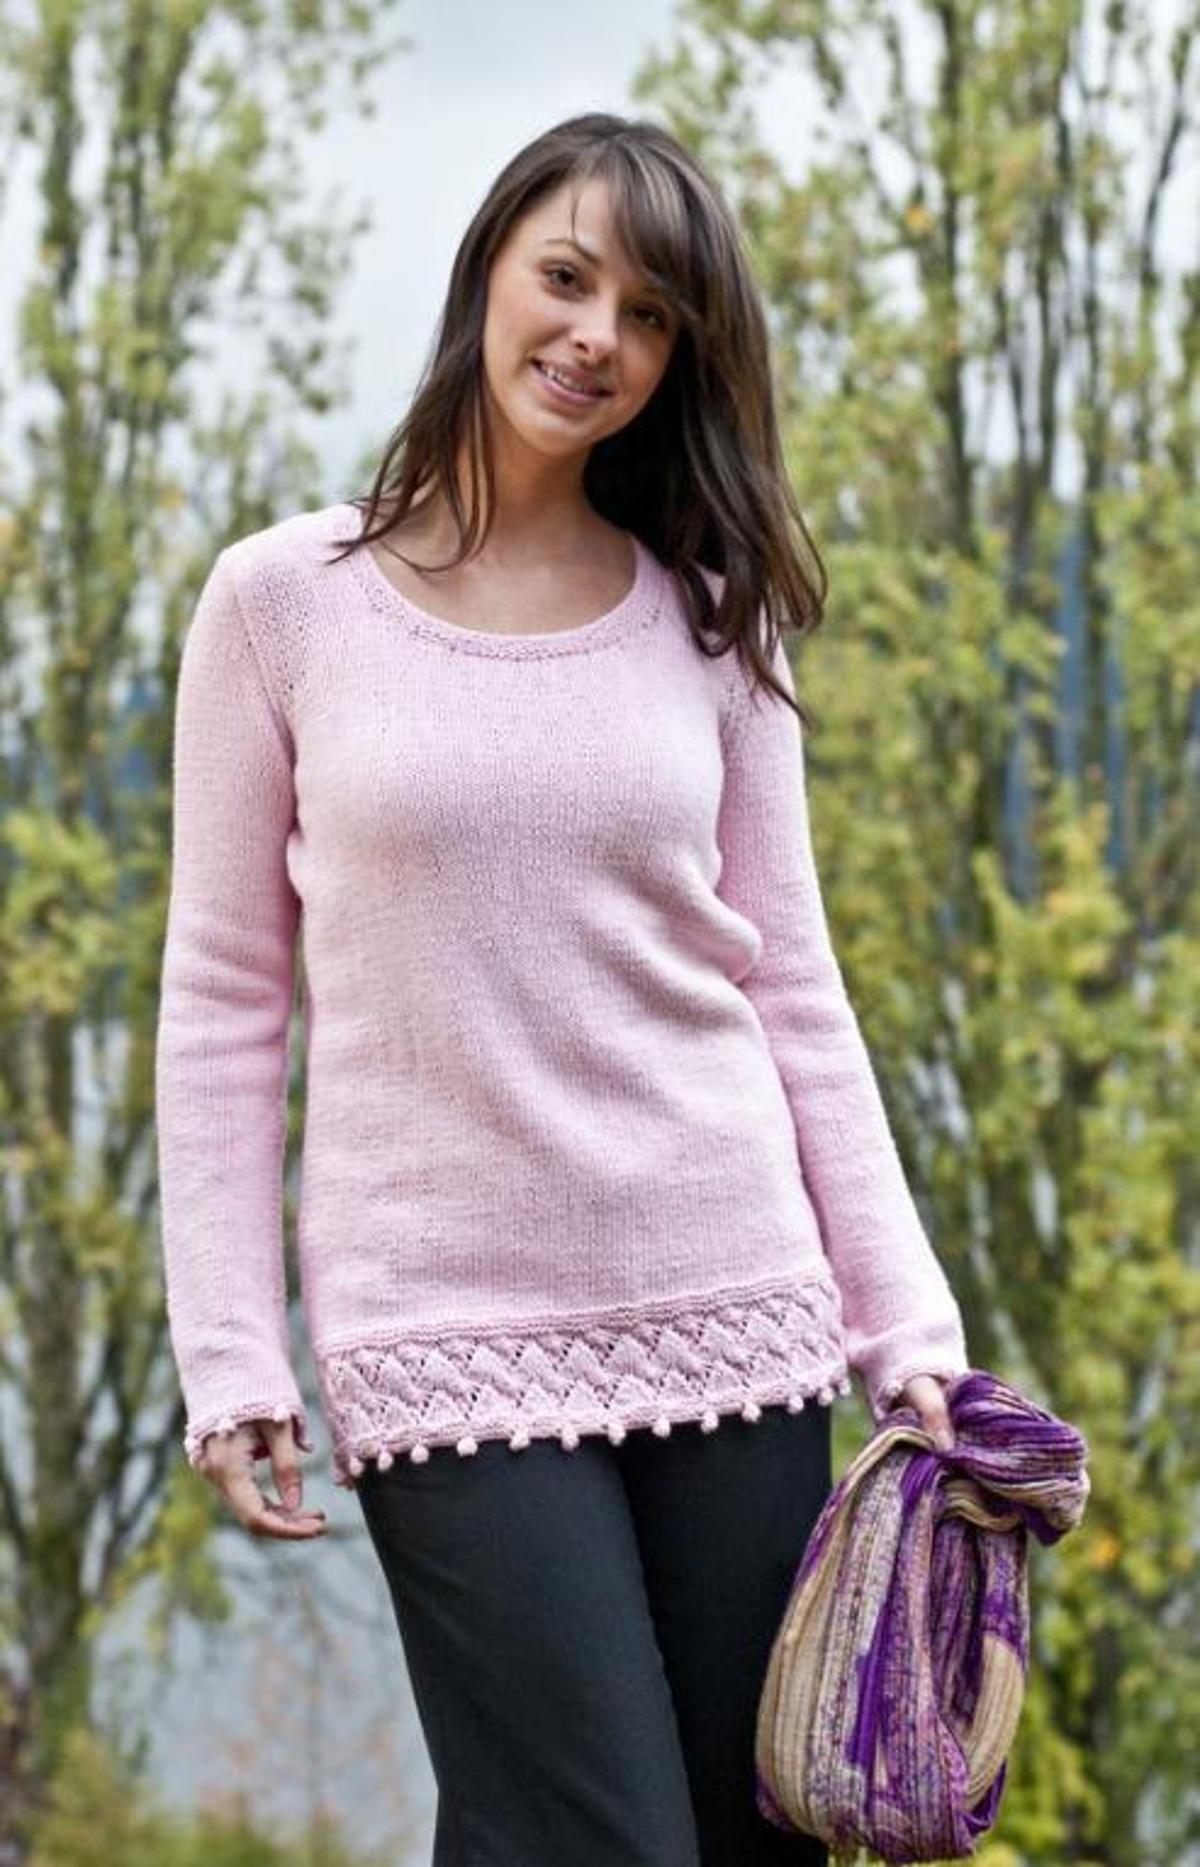 Springtime Tunic | Craftsy | Sweater knitting patterns ...